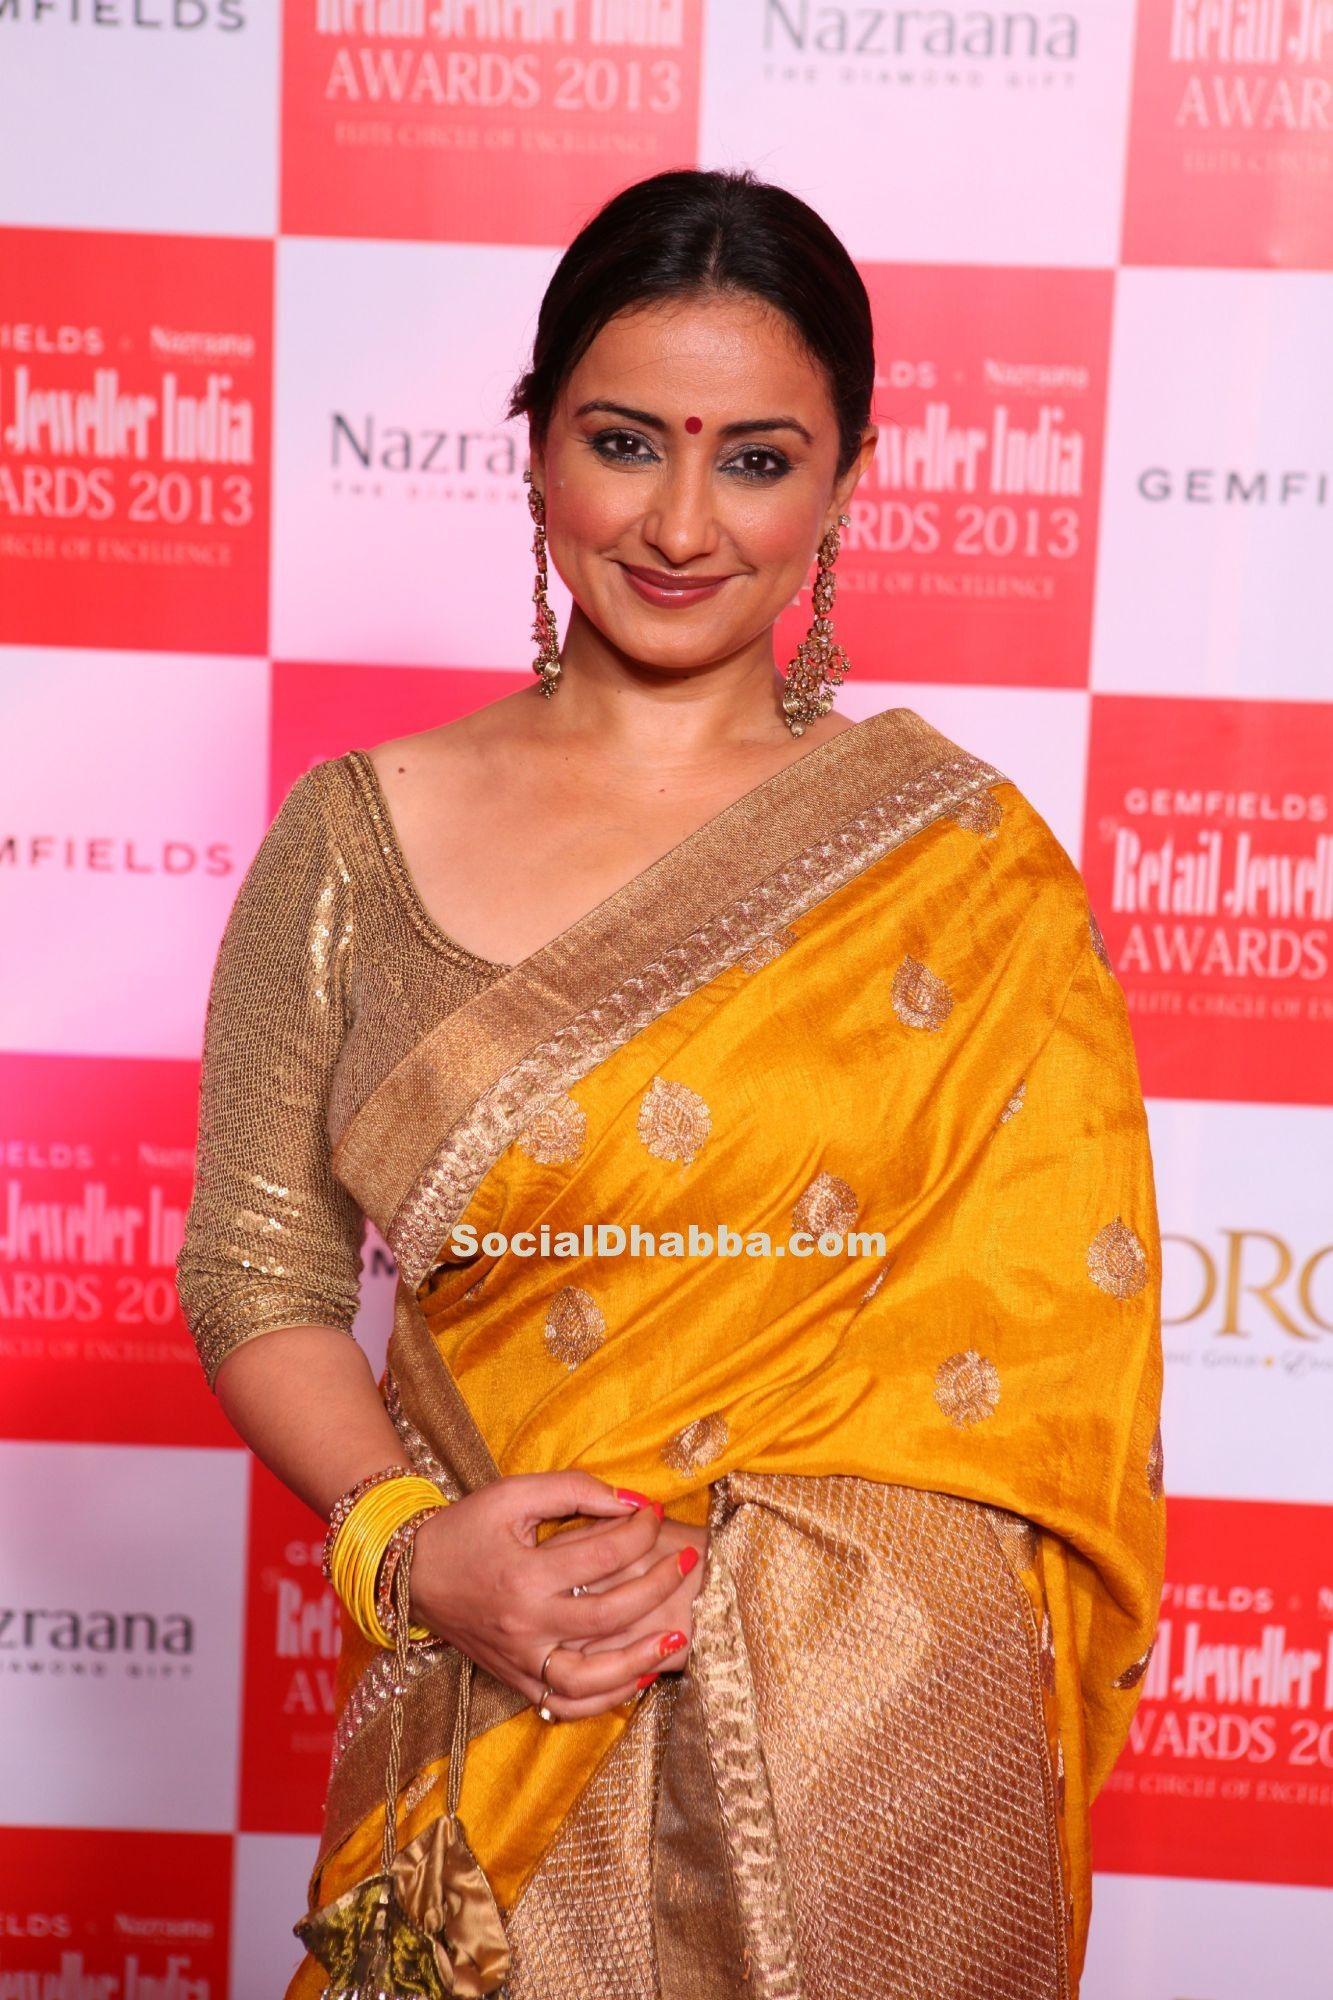 Watch Gayatri Joshi video